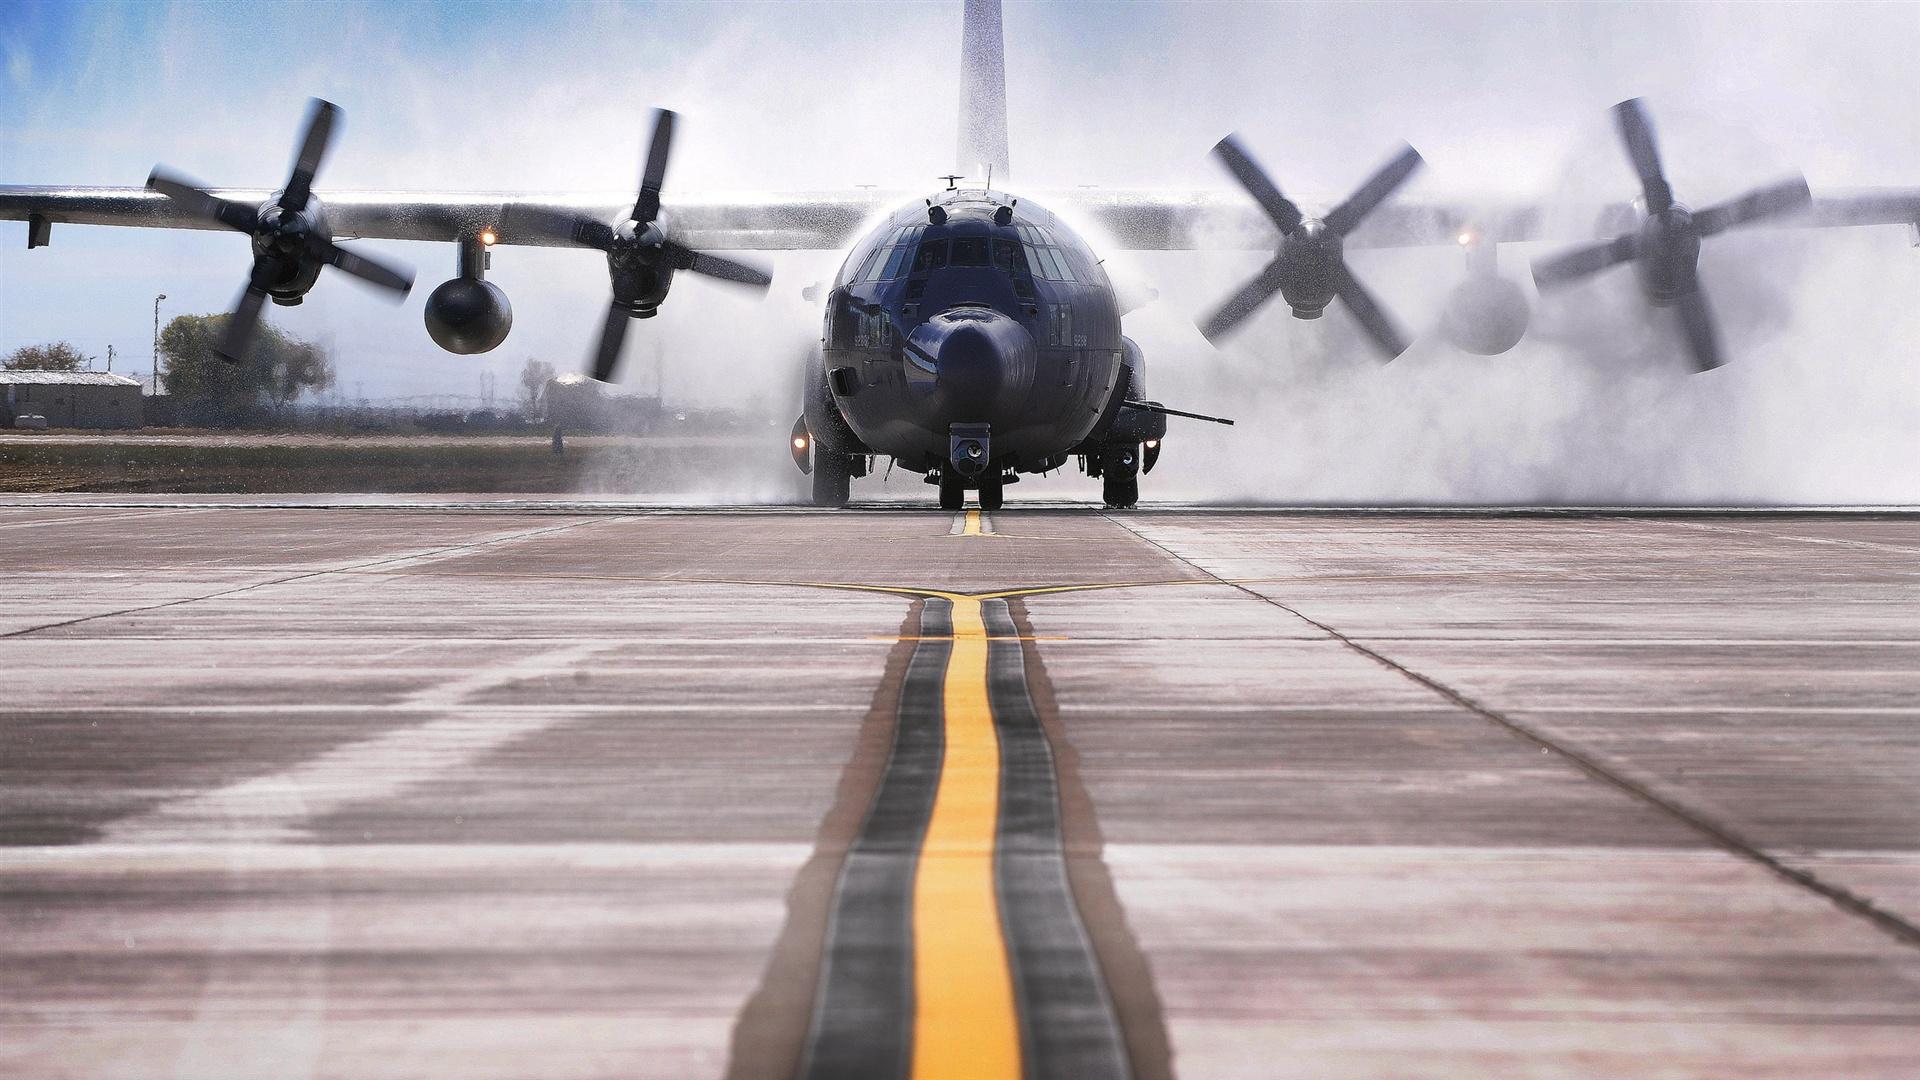 ac 130w stinger ii aircraft take off wallpaper 1920x1080